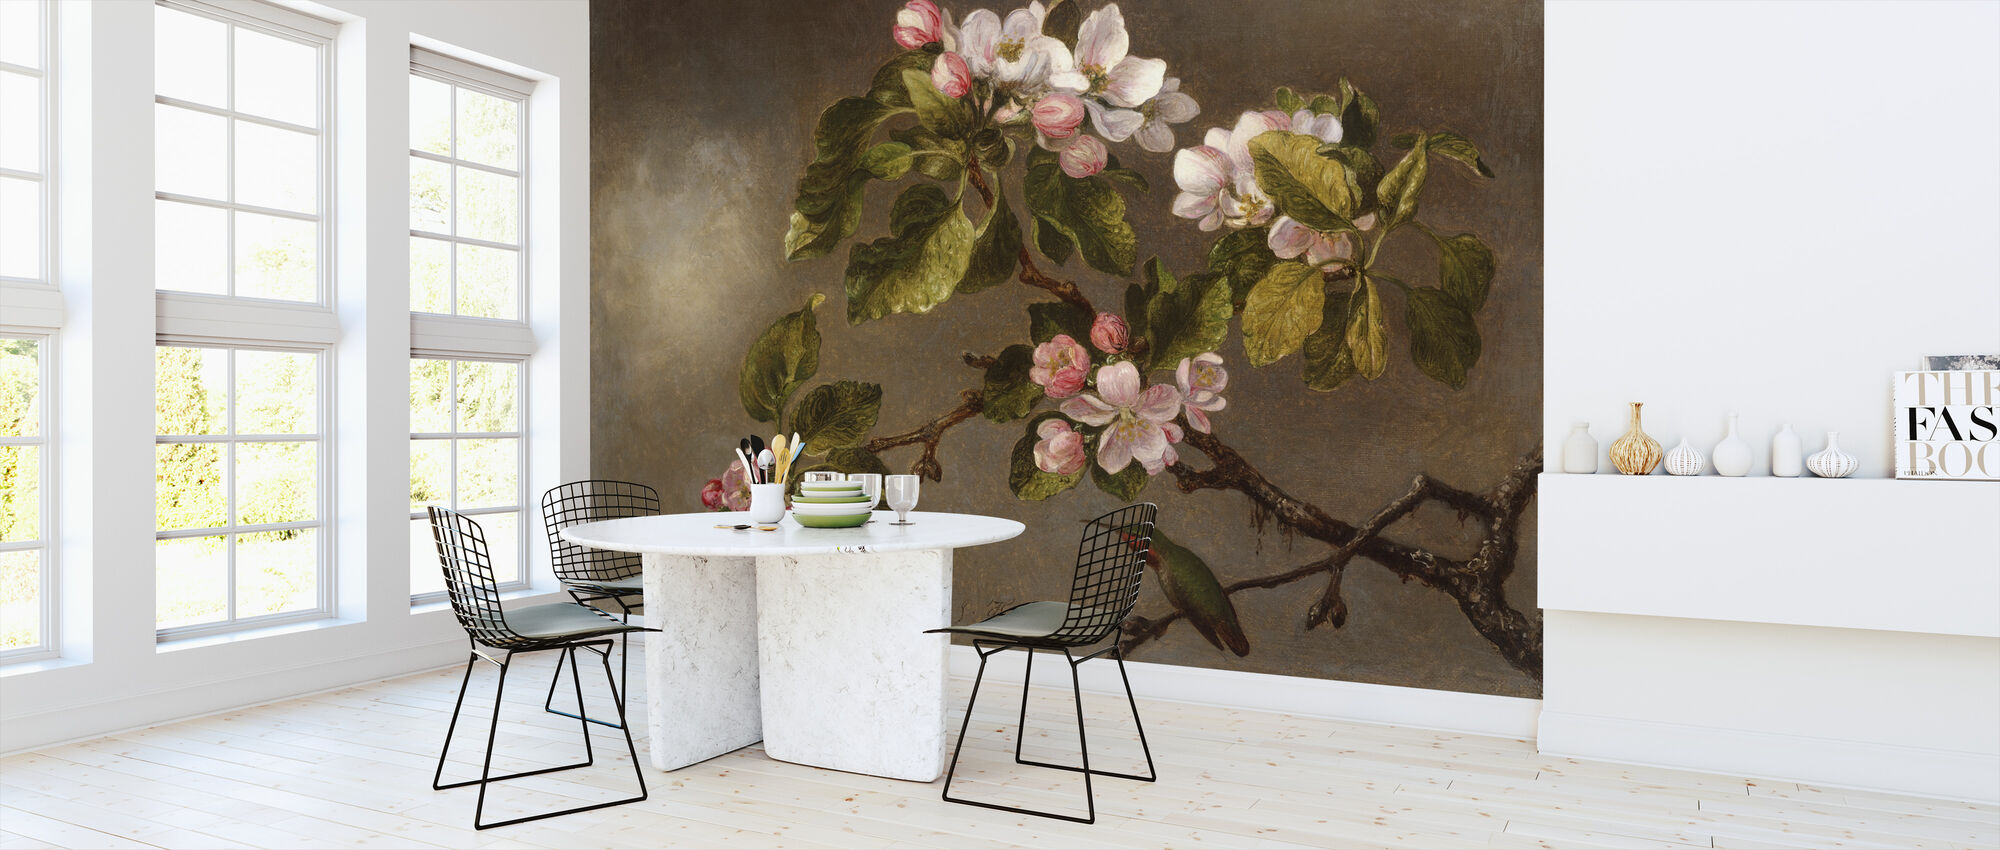 Hummingbird and Apple Blossoms - Martin Johnson Heade - Wallpaper - Kitchen